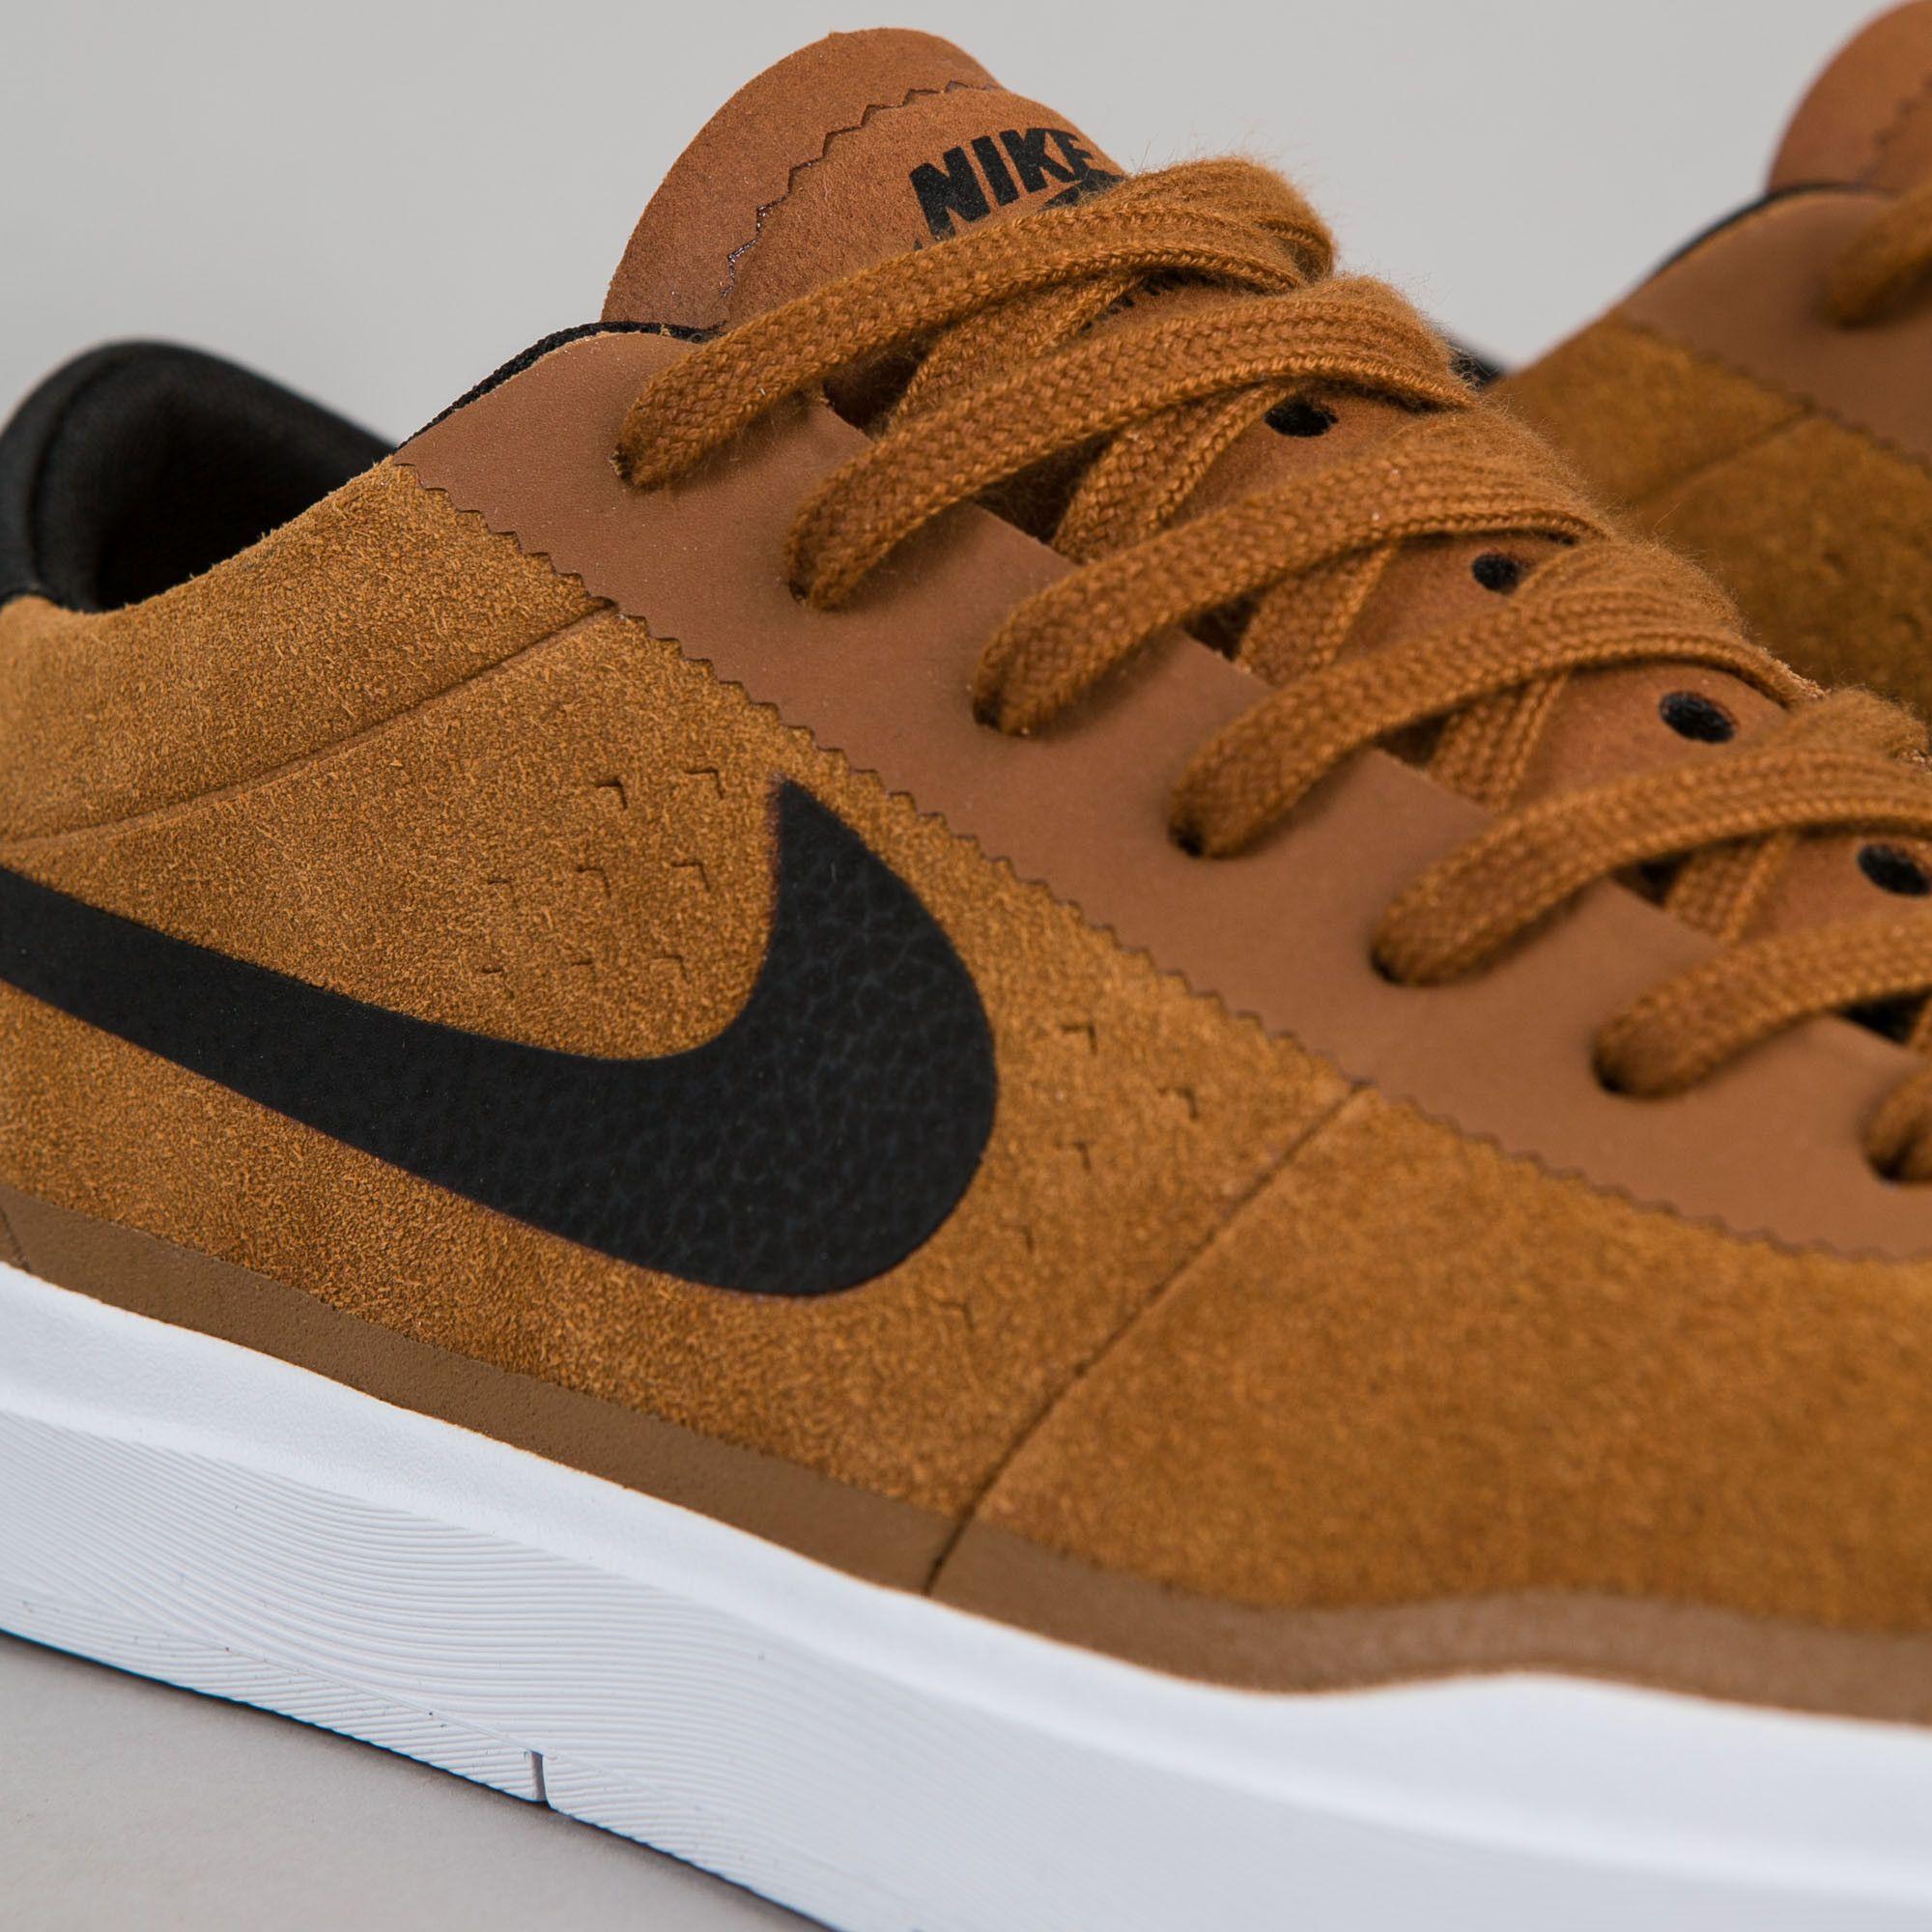 Nike SB Bruin Hyperfeel Shoes - Hazelnut / Black - White